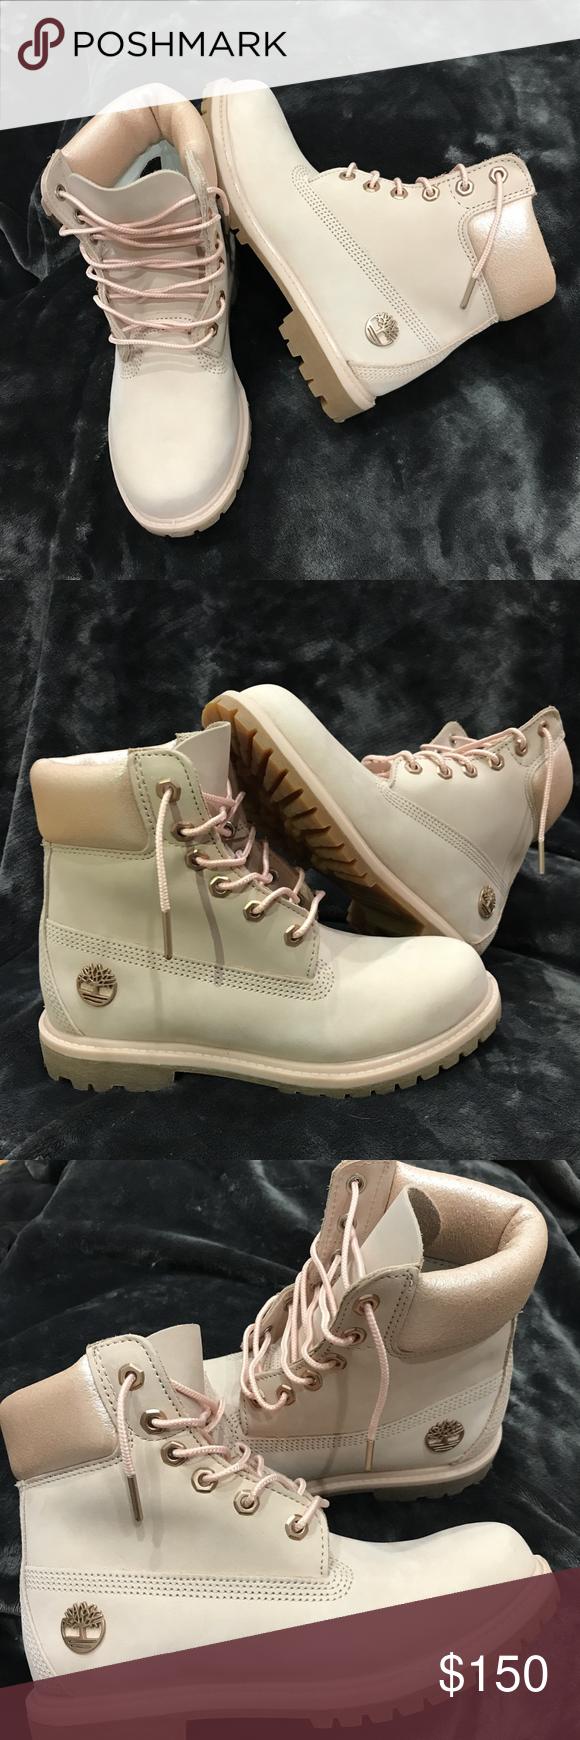 "Light Pink Nubuck Timberland 6"" Boots • style A1HL6662 • size women's 7 •  worn"